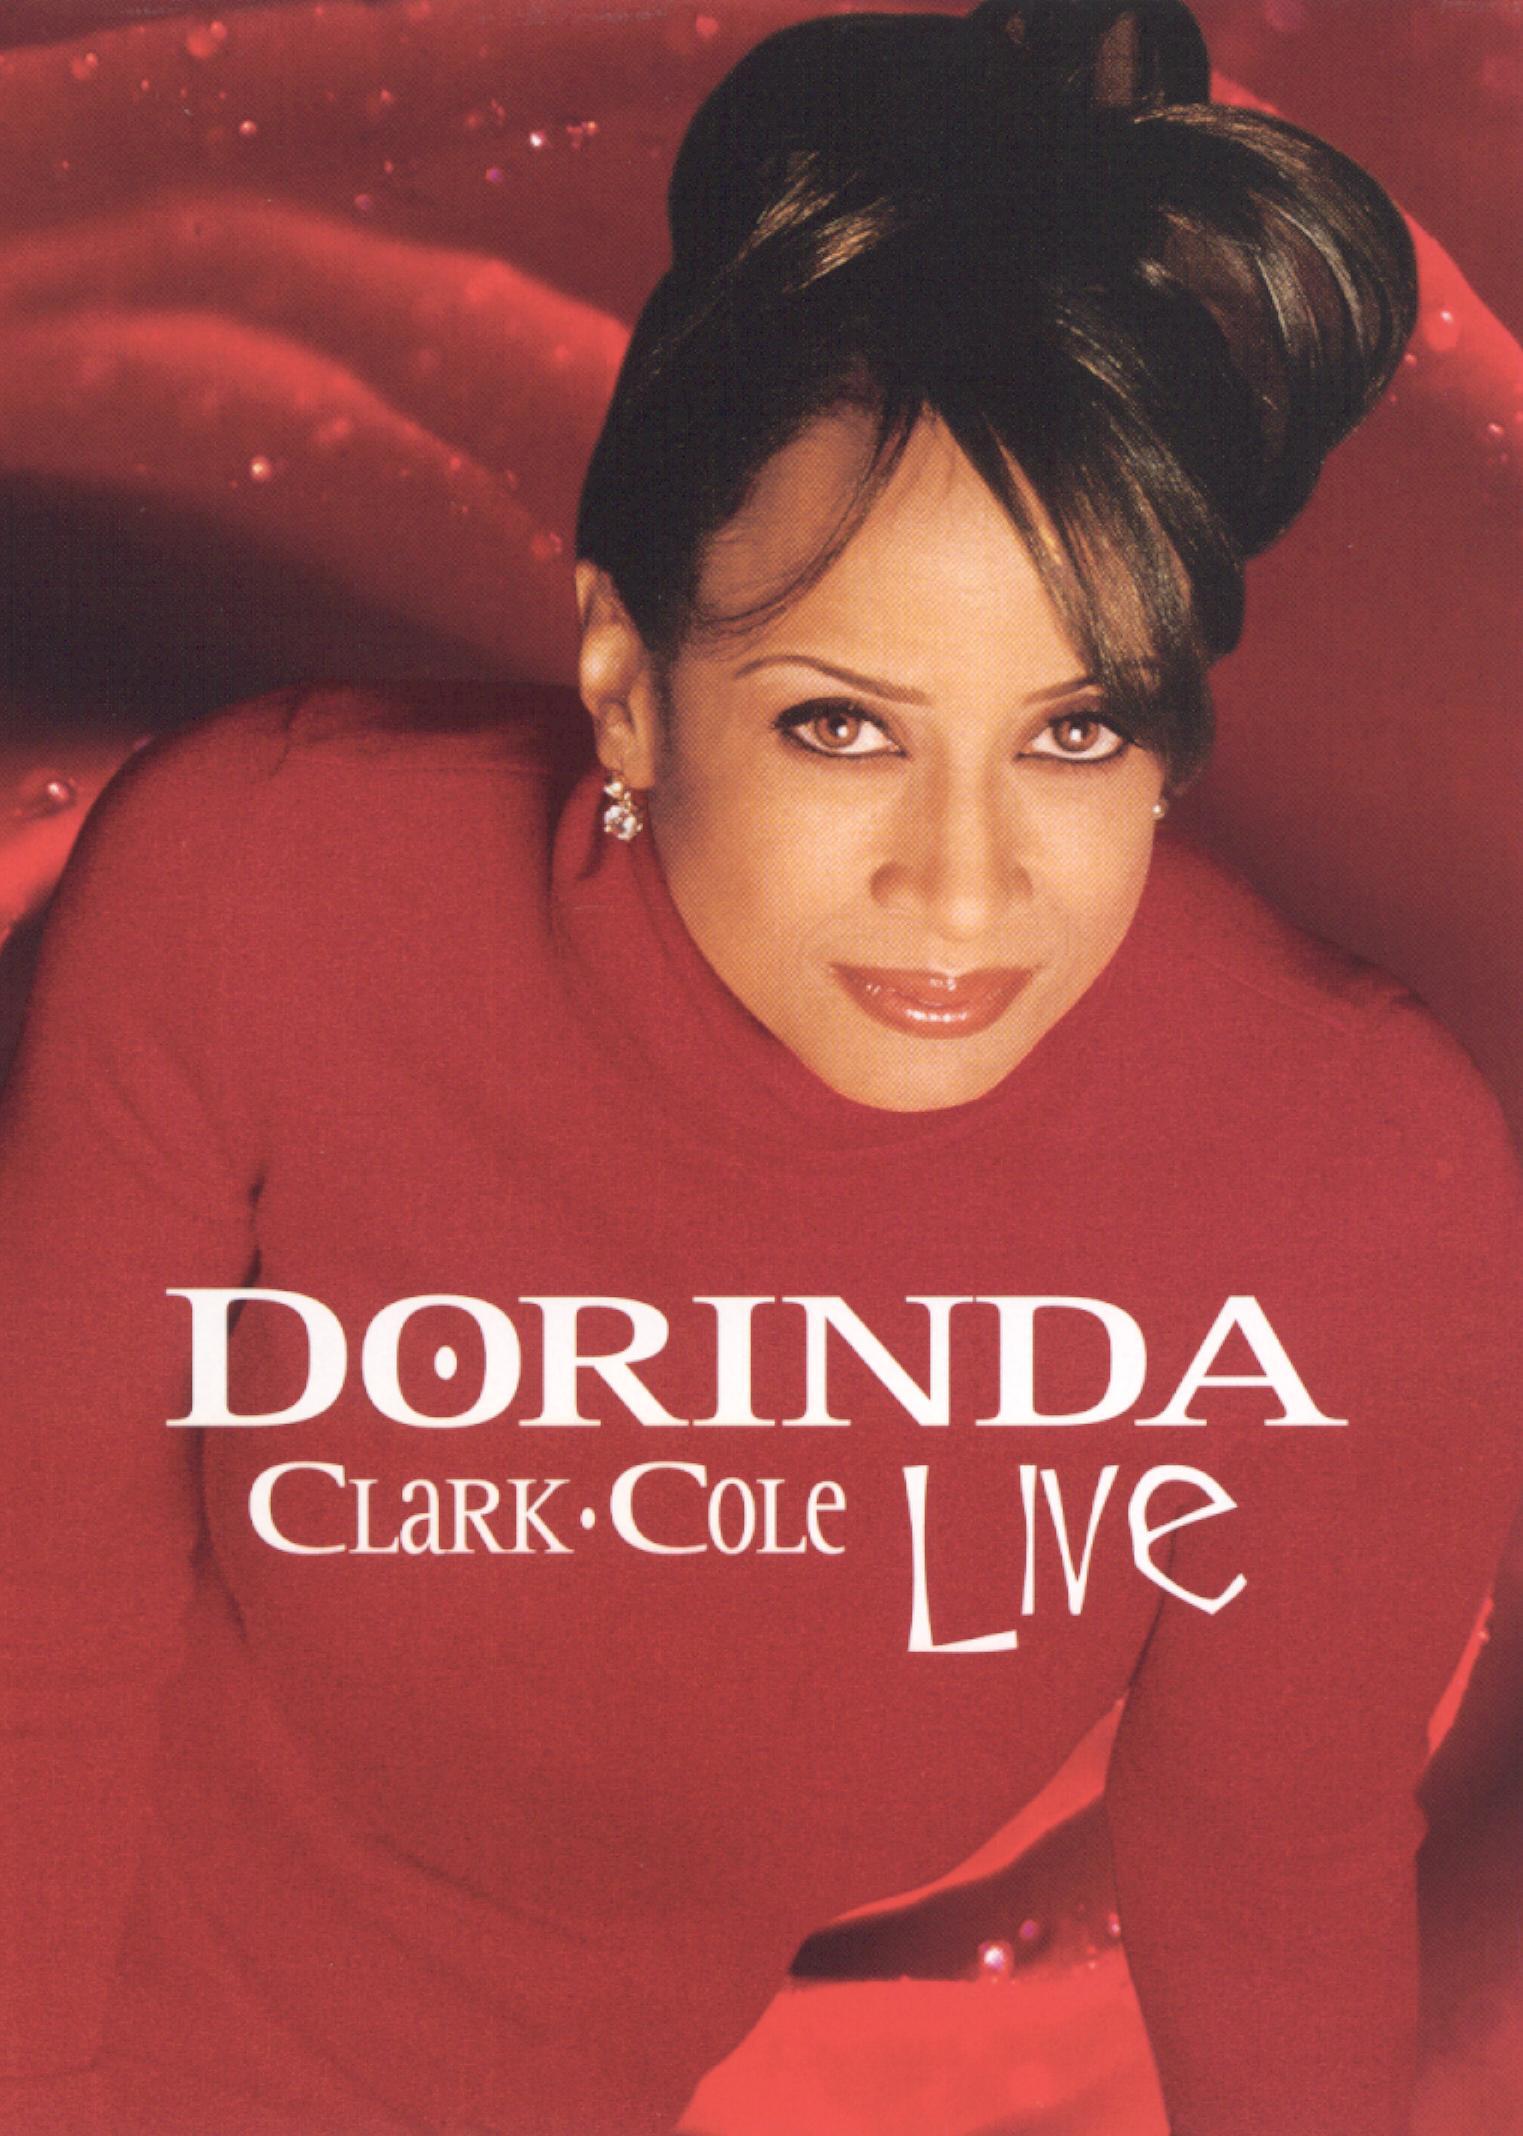 Dorinda Clark-Cole Live